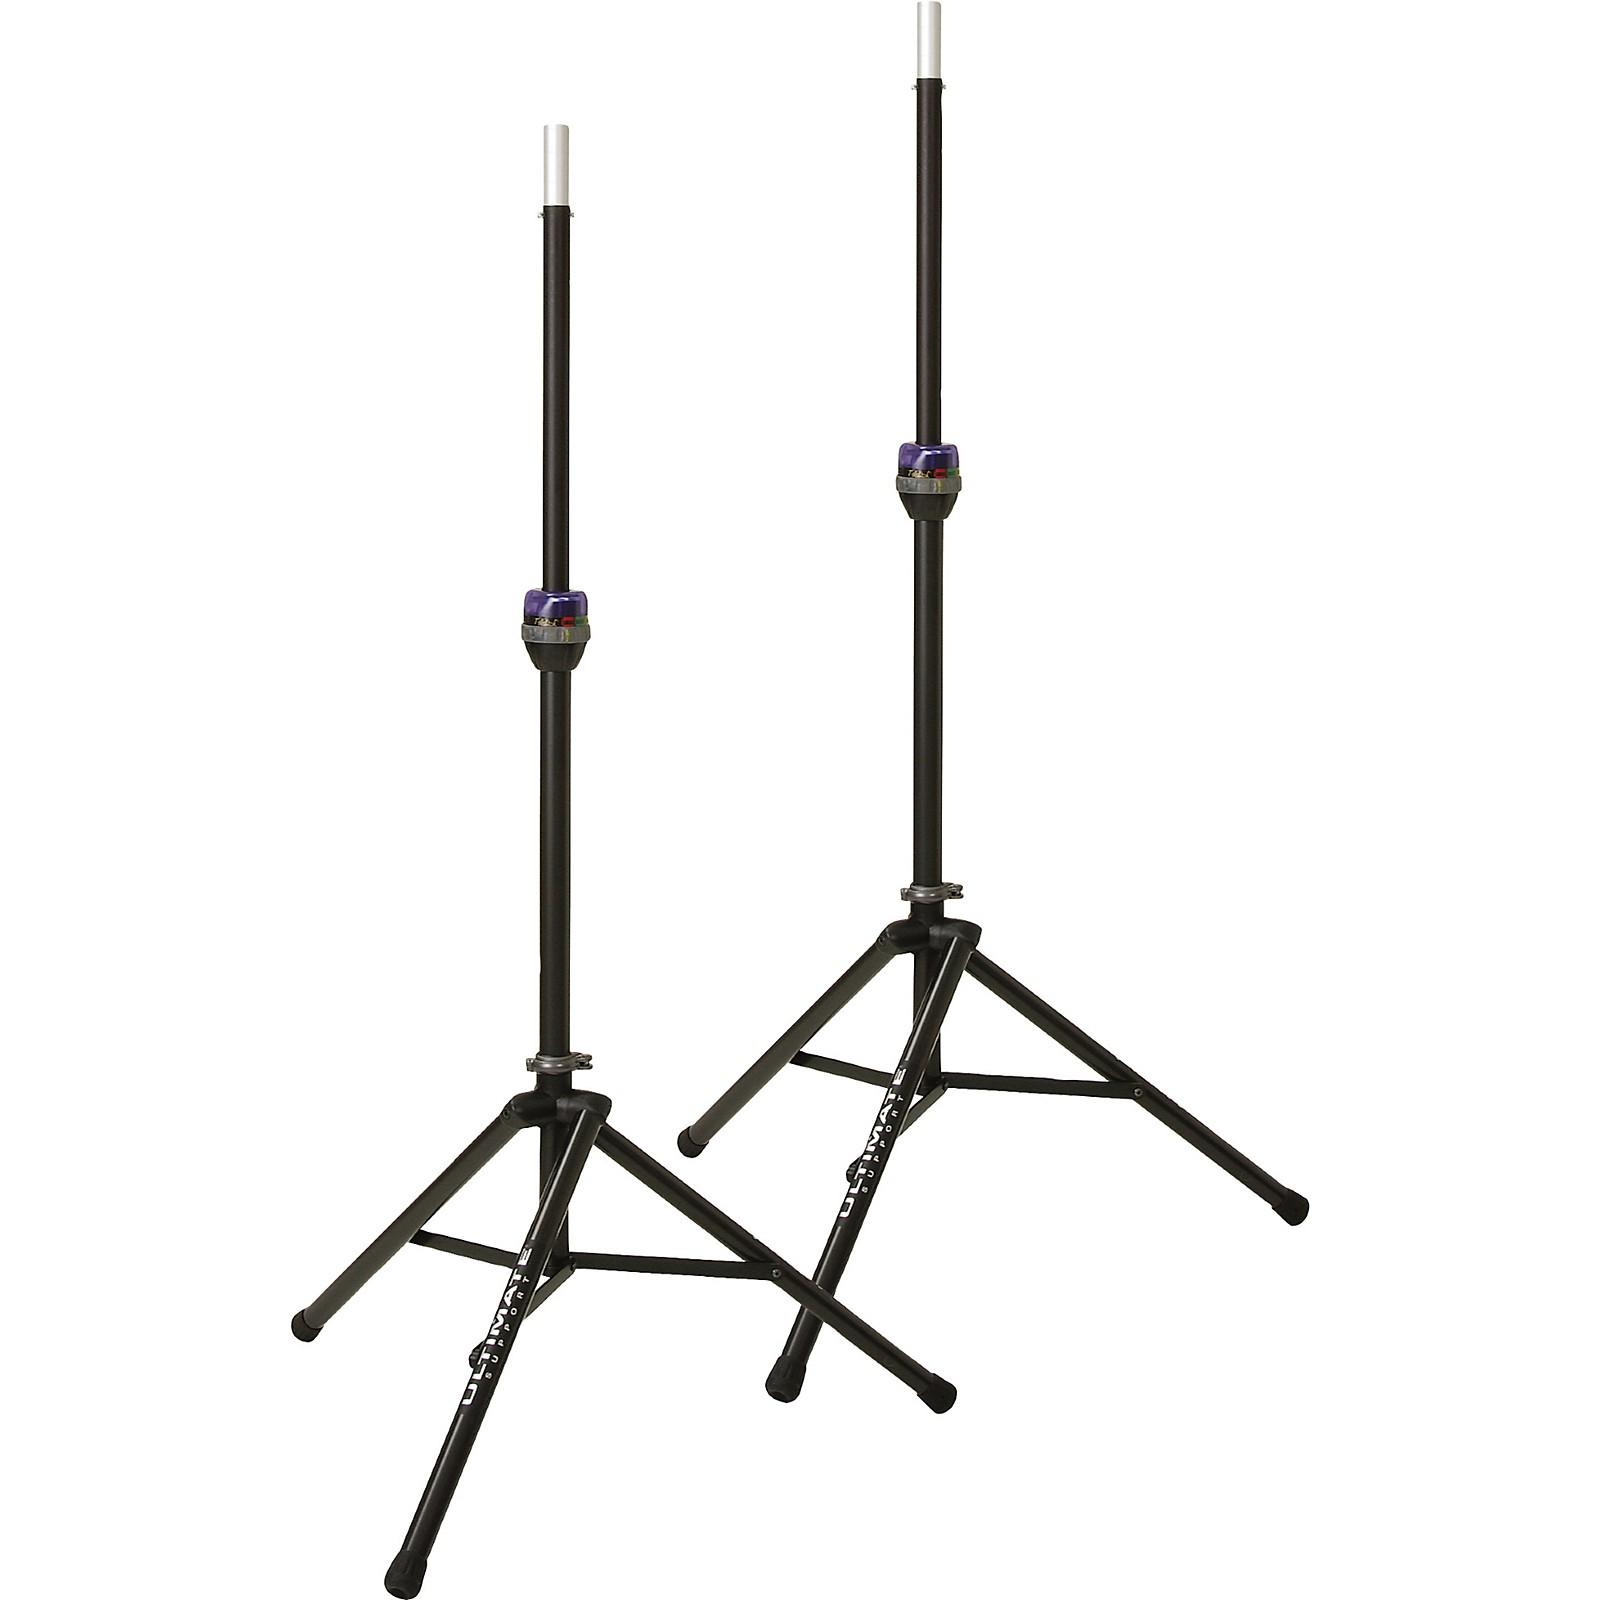 Ultimate Support Ts 90b Telelock Tripod Speaker Stand Pair